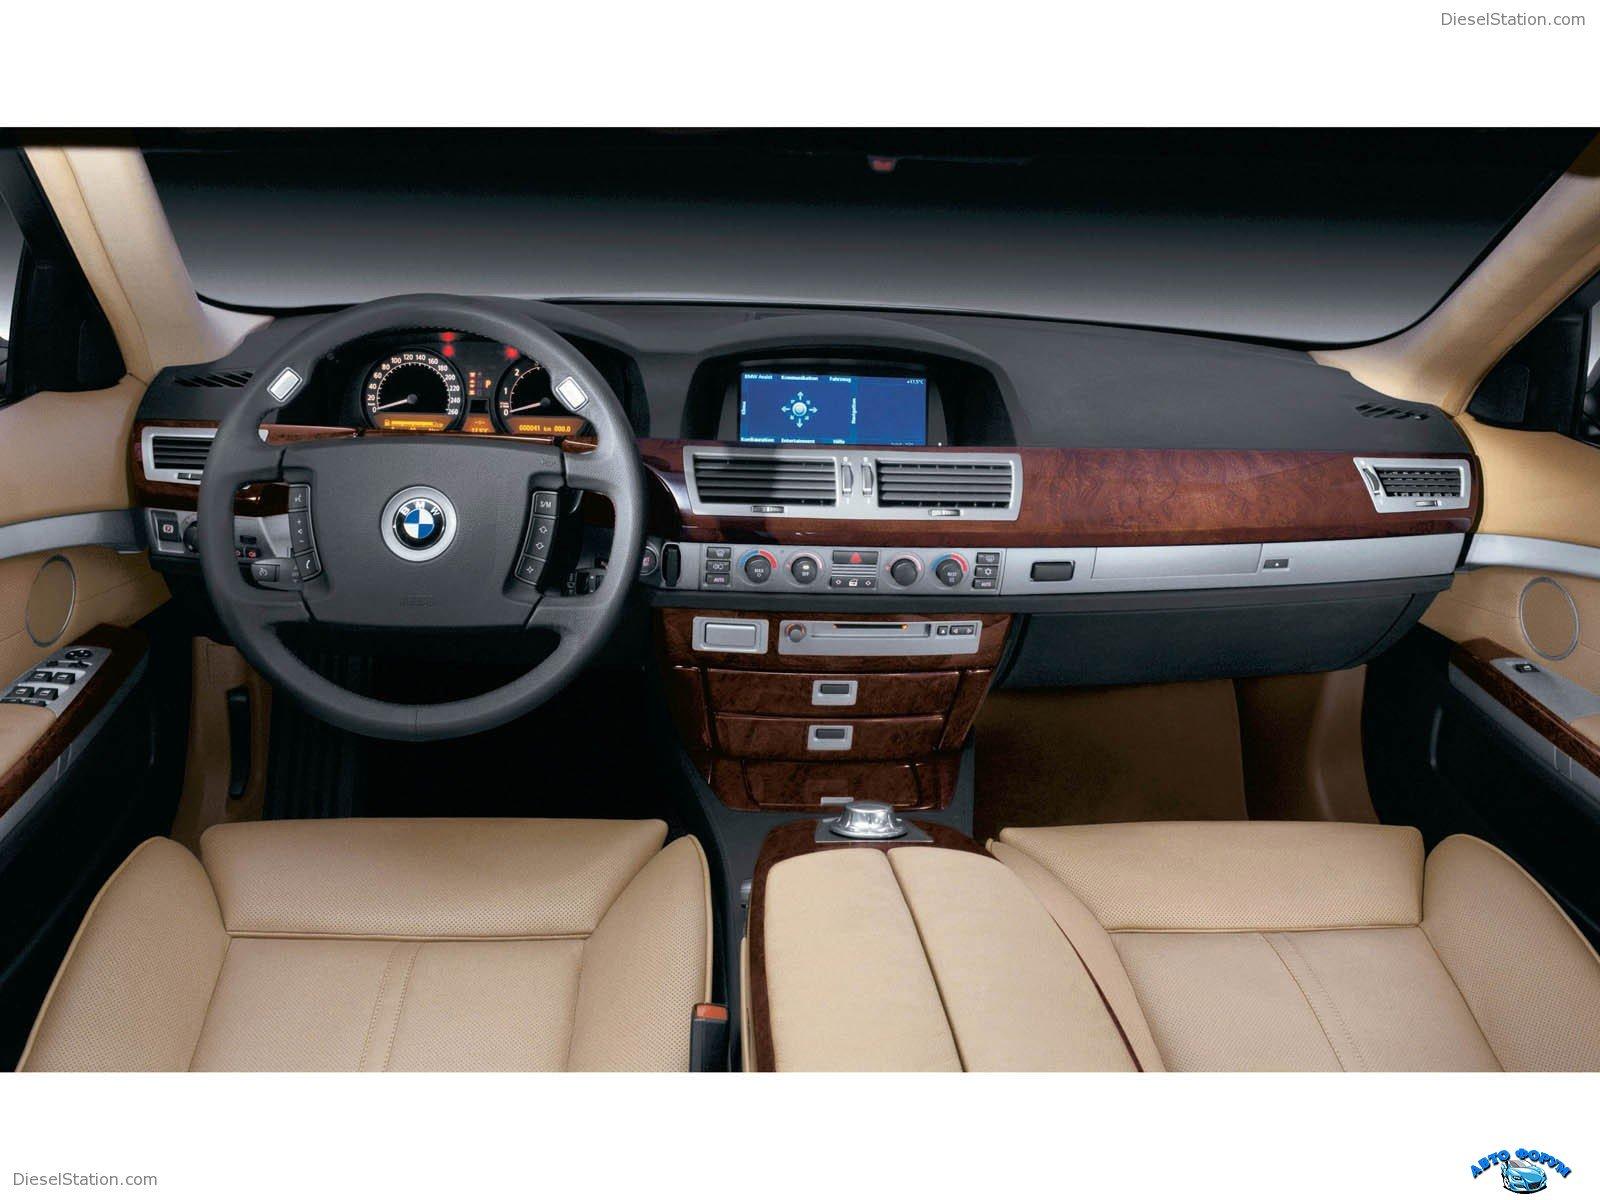 BMW-7Series-042.jpg